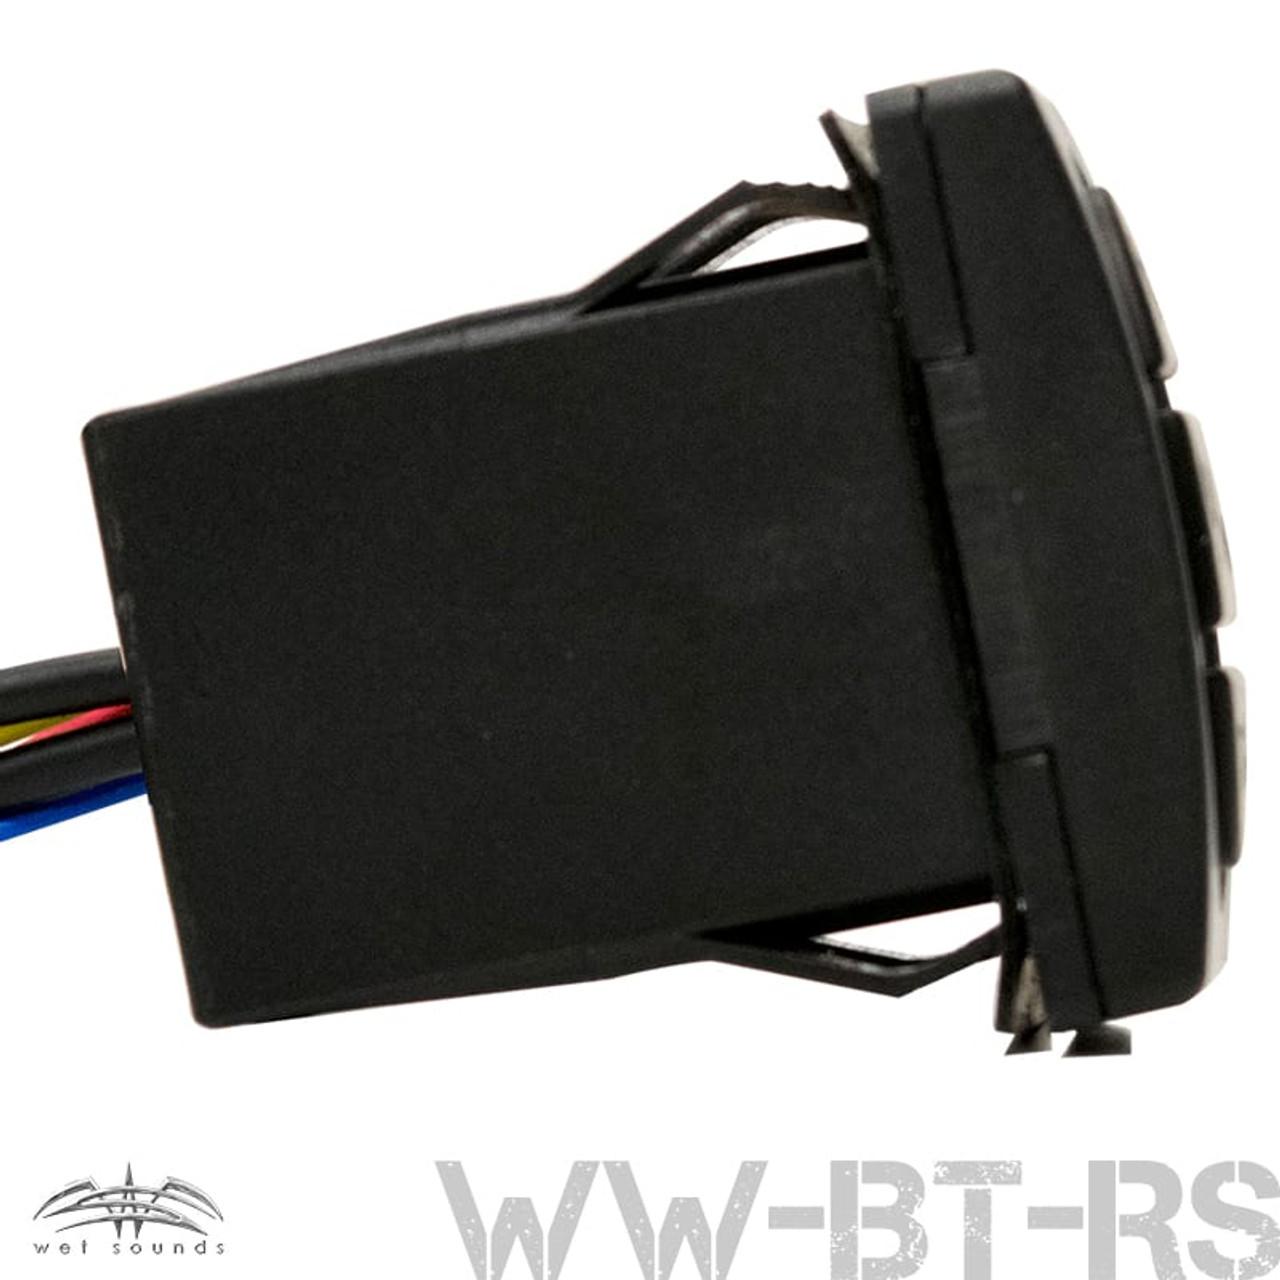 Universal Rocker Switch Bluetooth Receiver Audio Controller with AUX Input UTV-BTRS Waterproof UTV Powersports Accessories